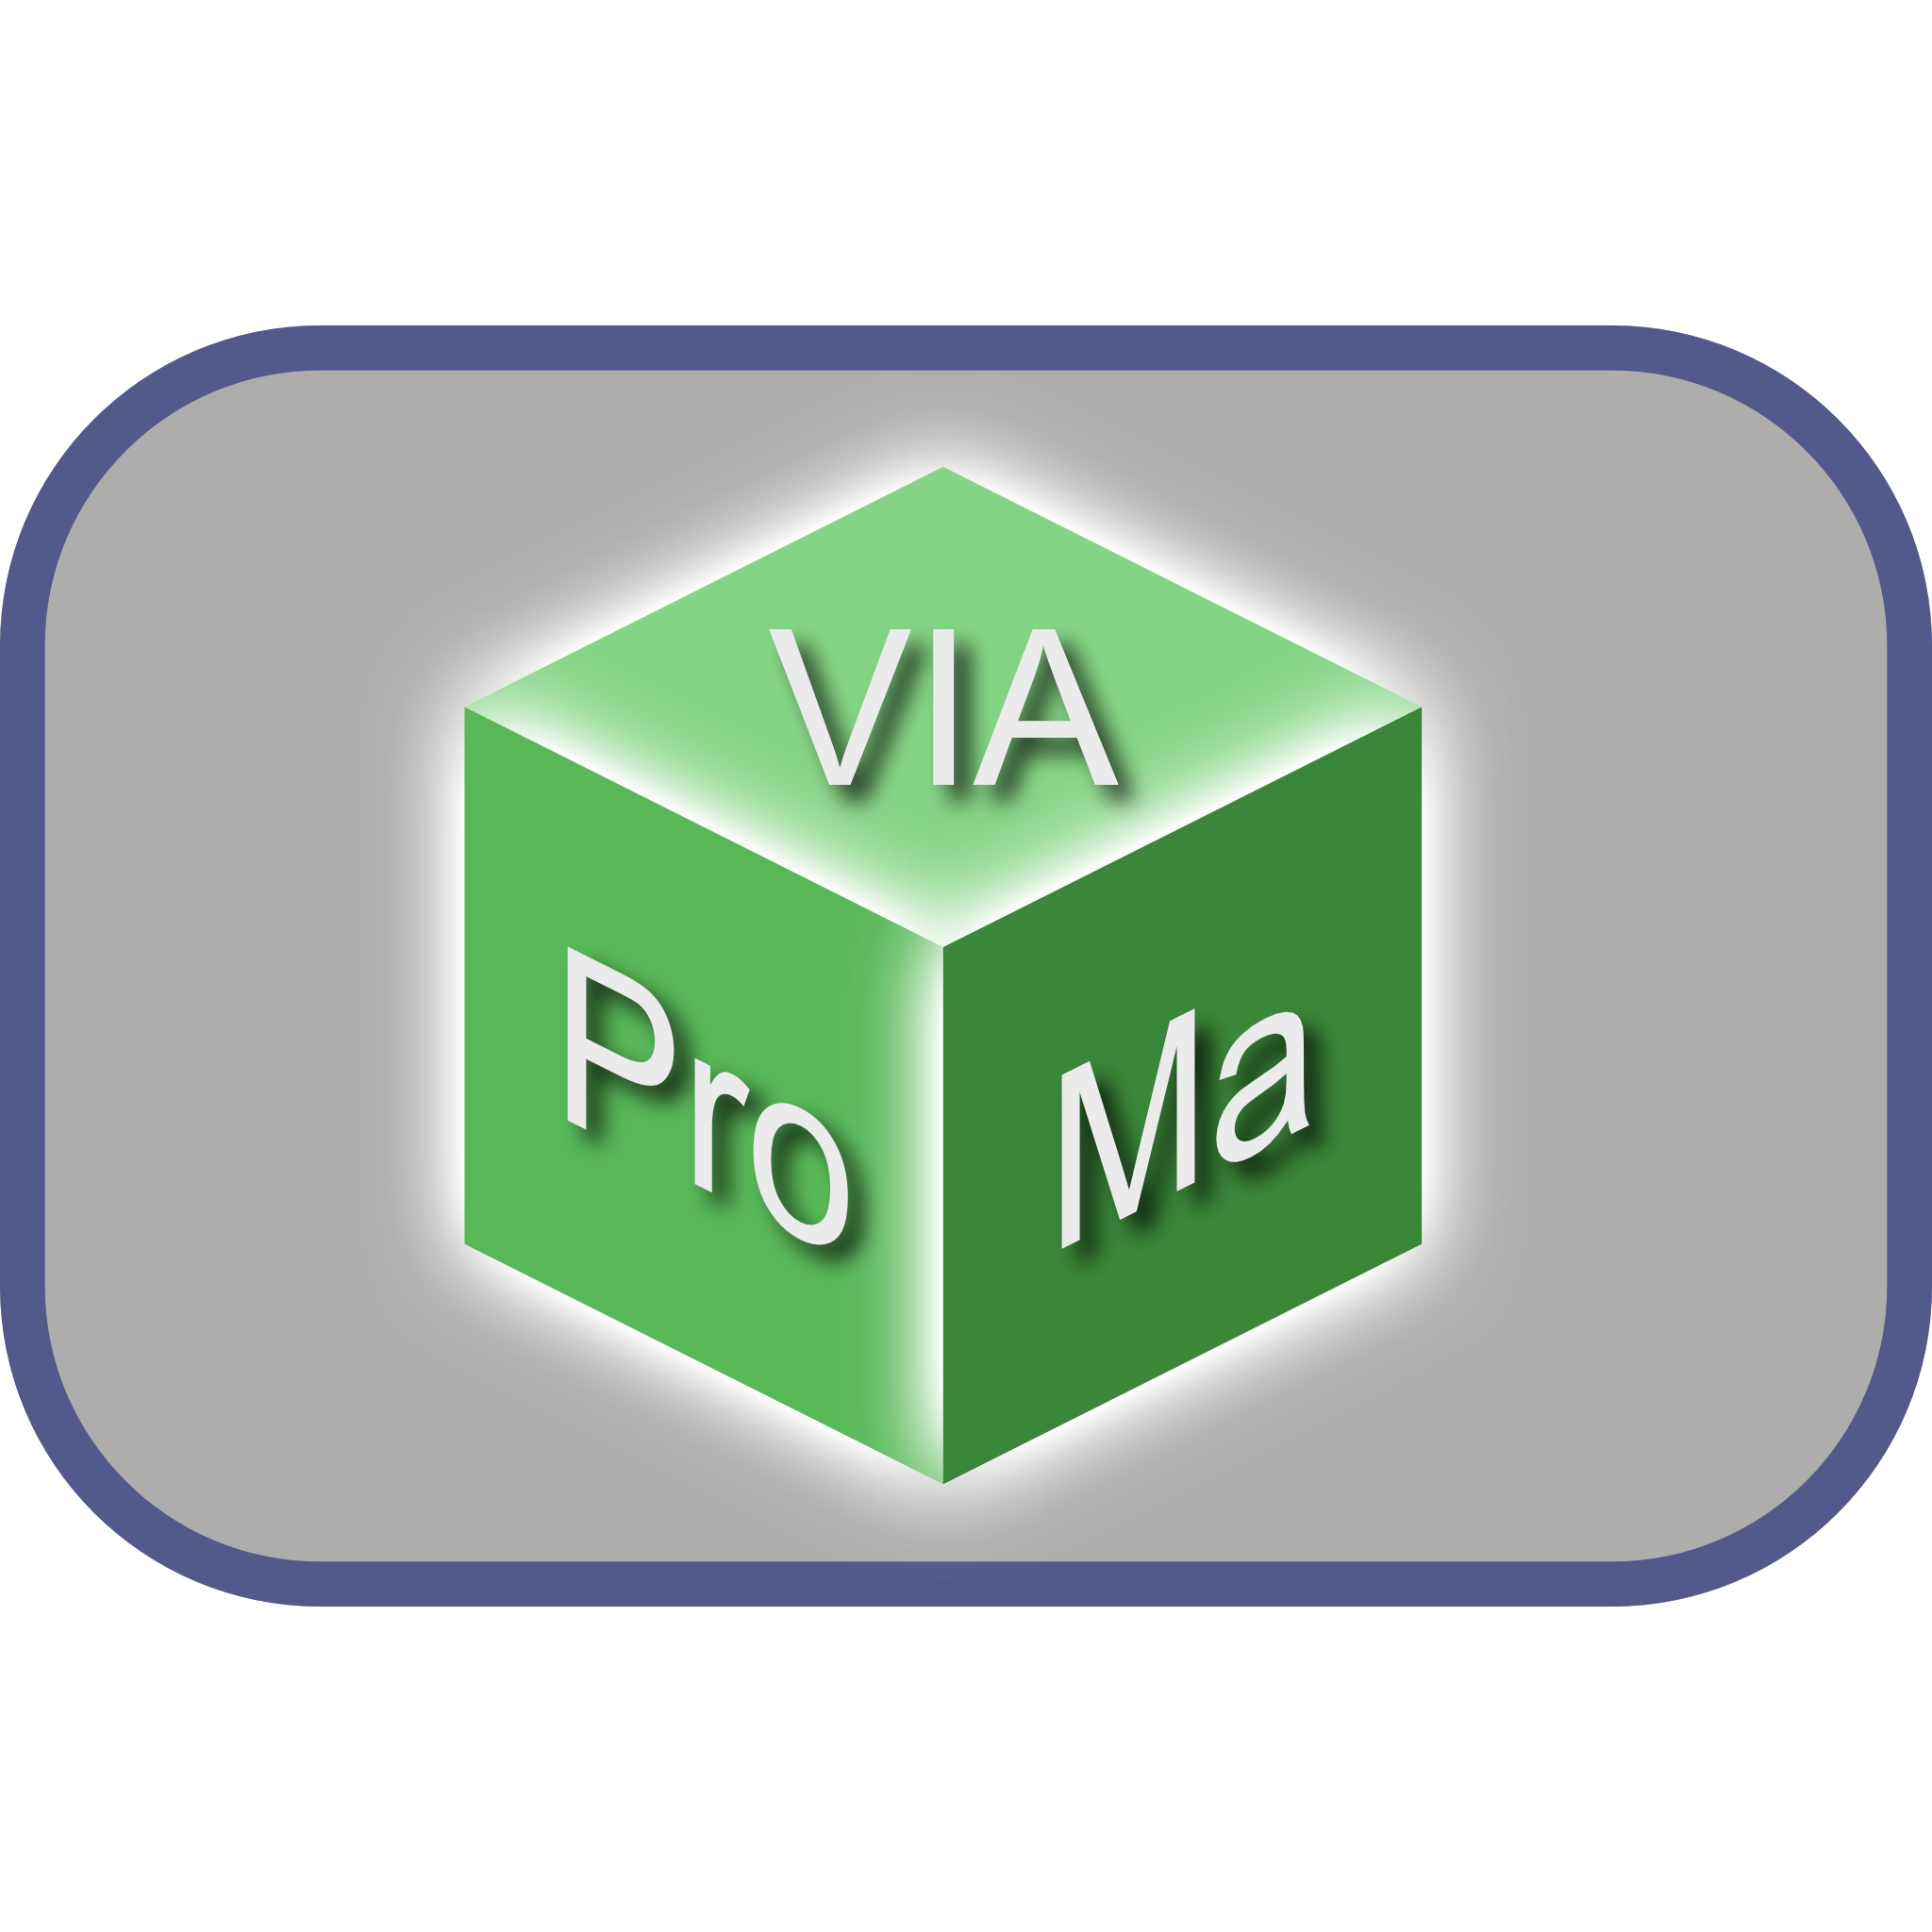 VIAProMa Logo